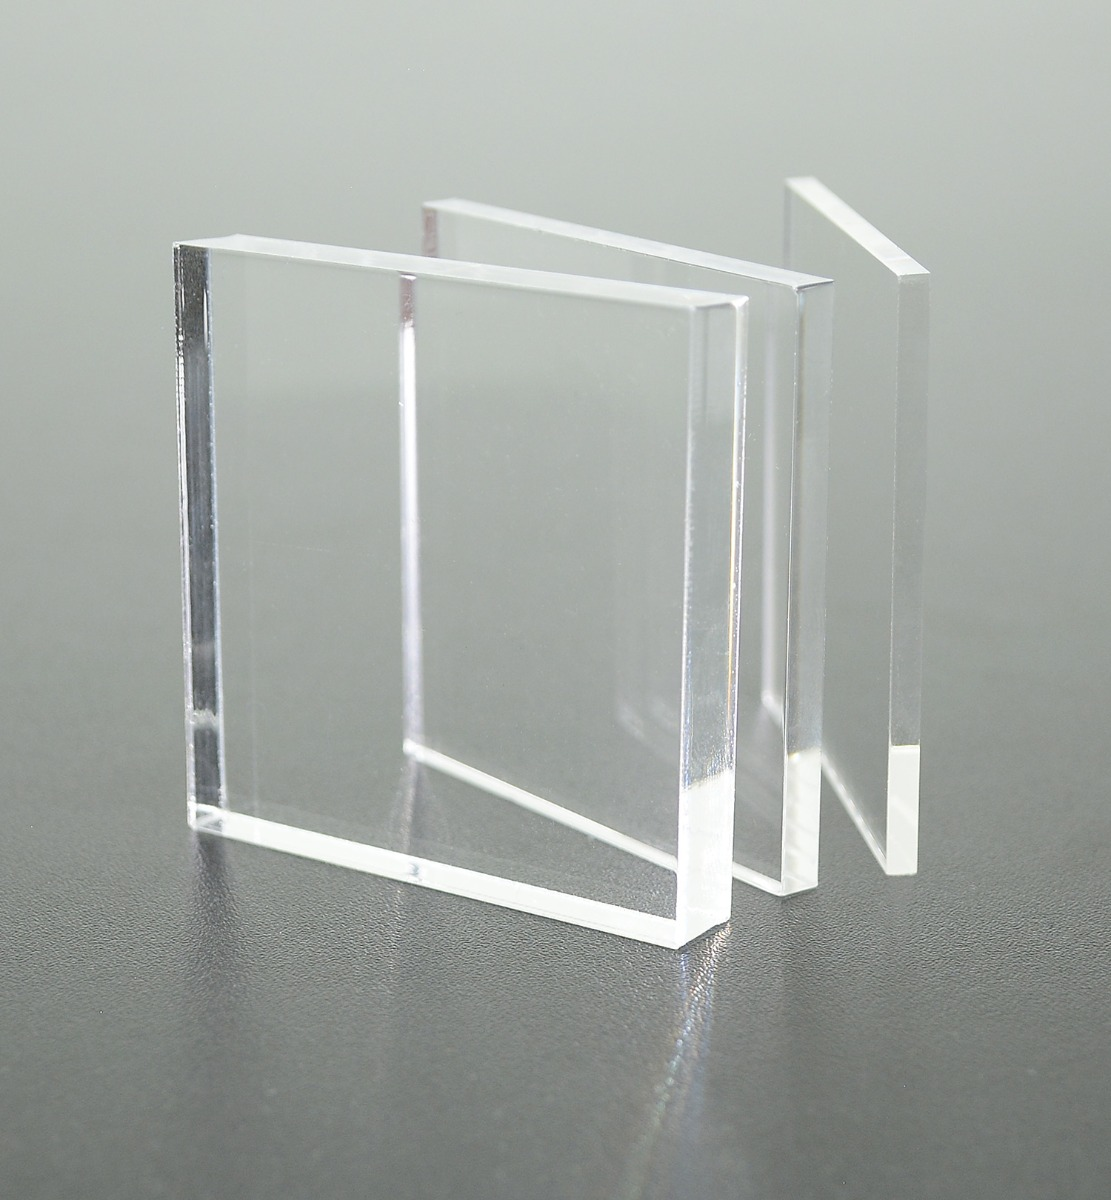 Acrylglasplatte - Hauptbild